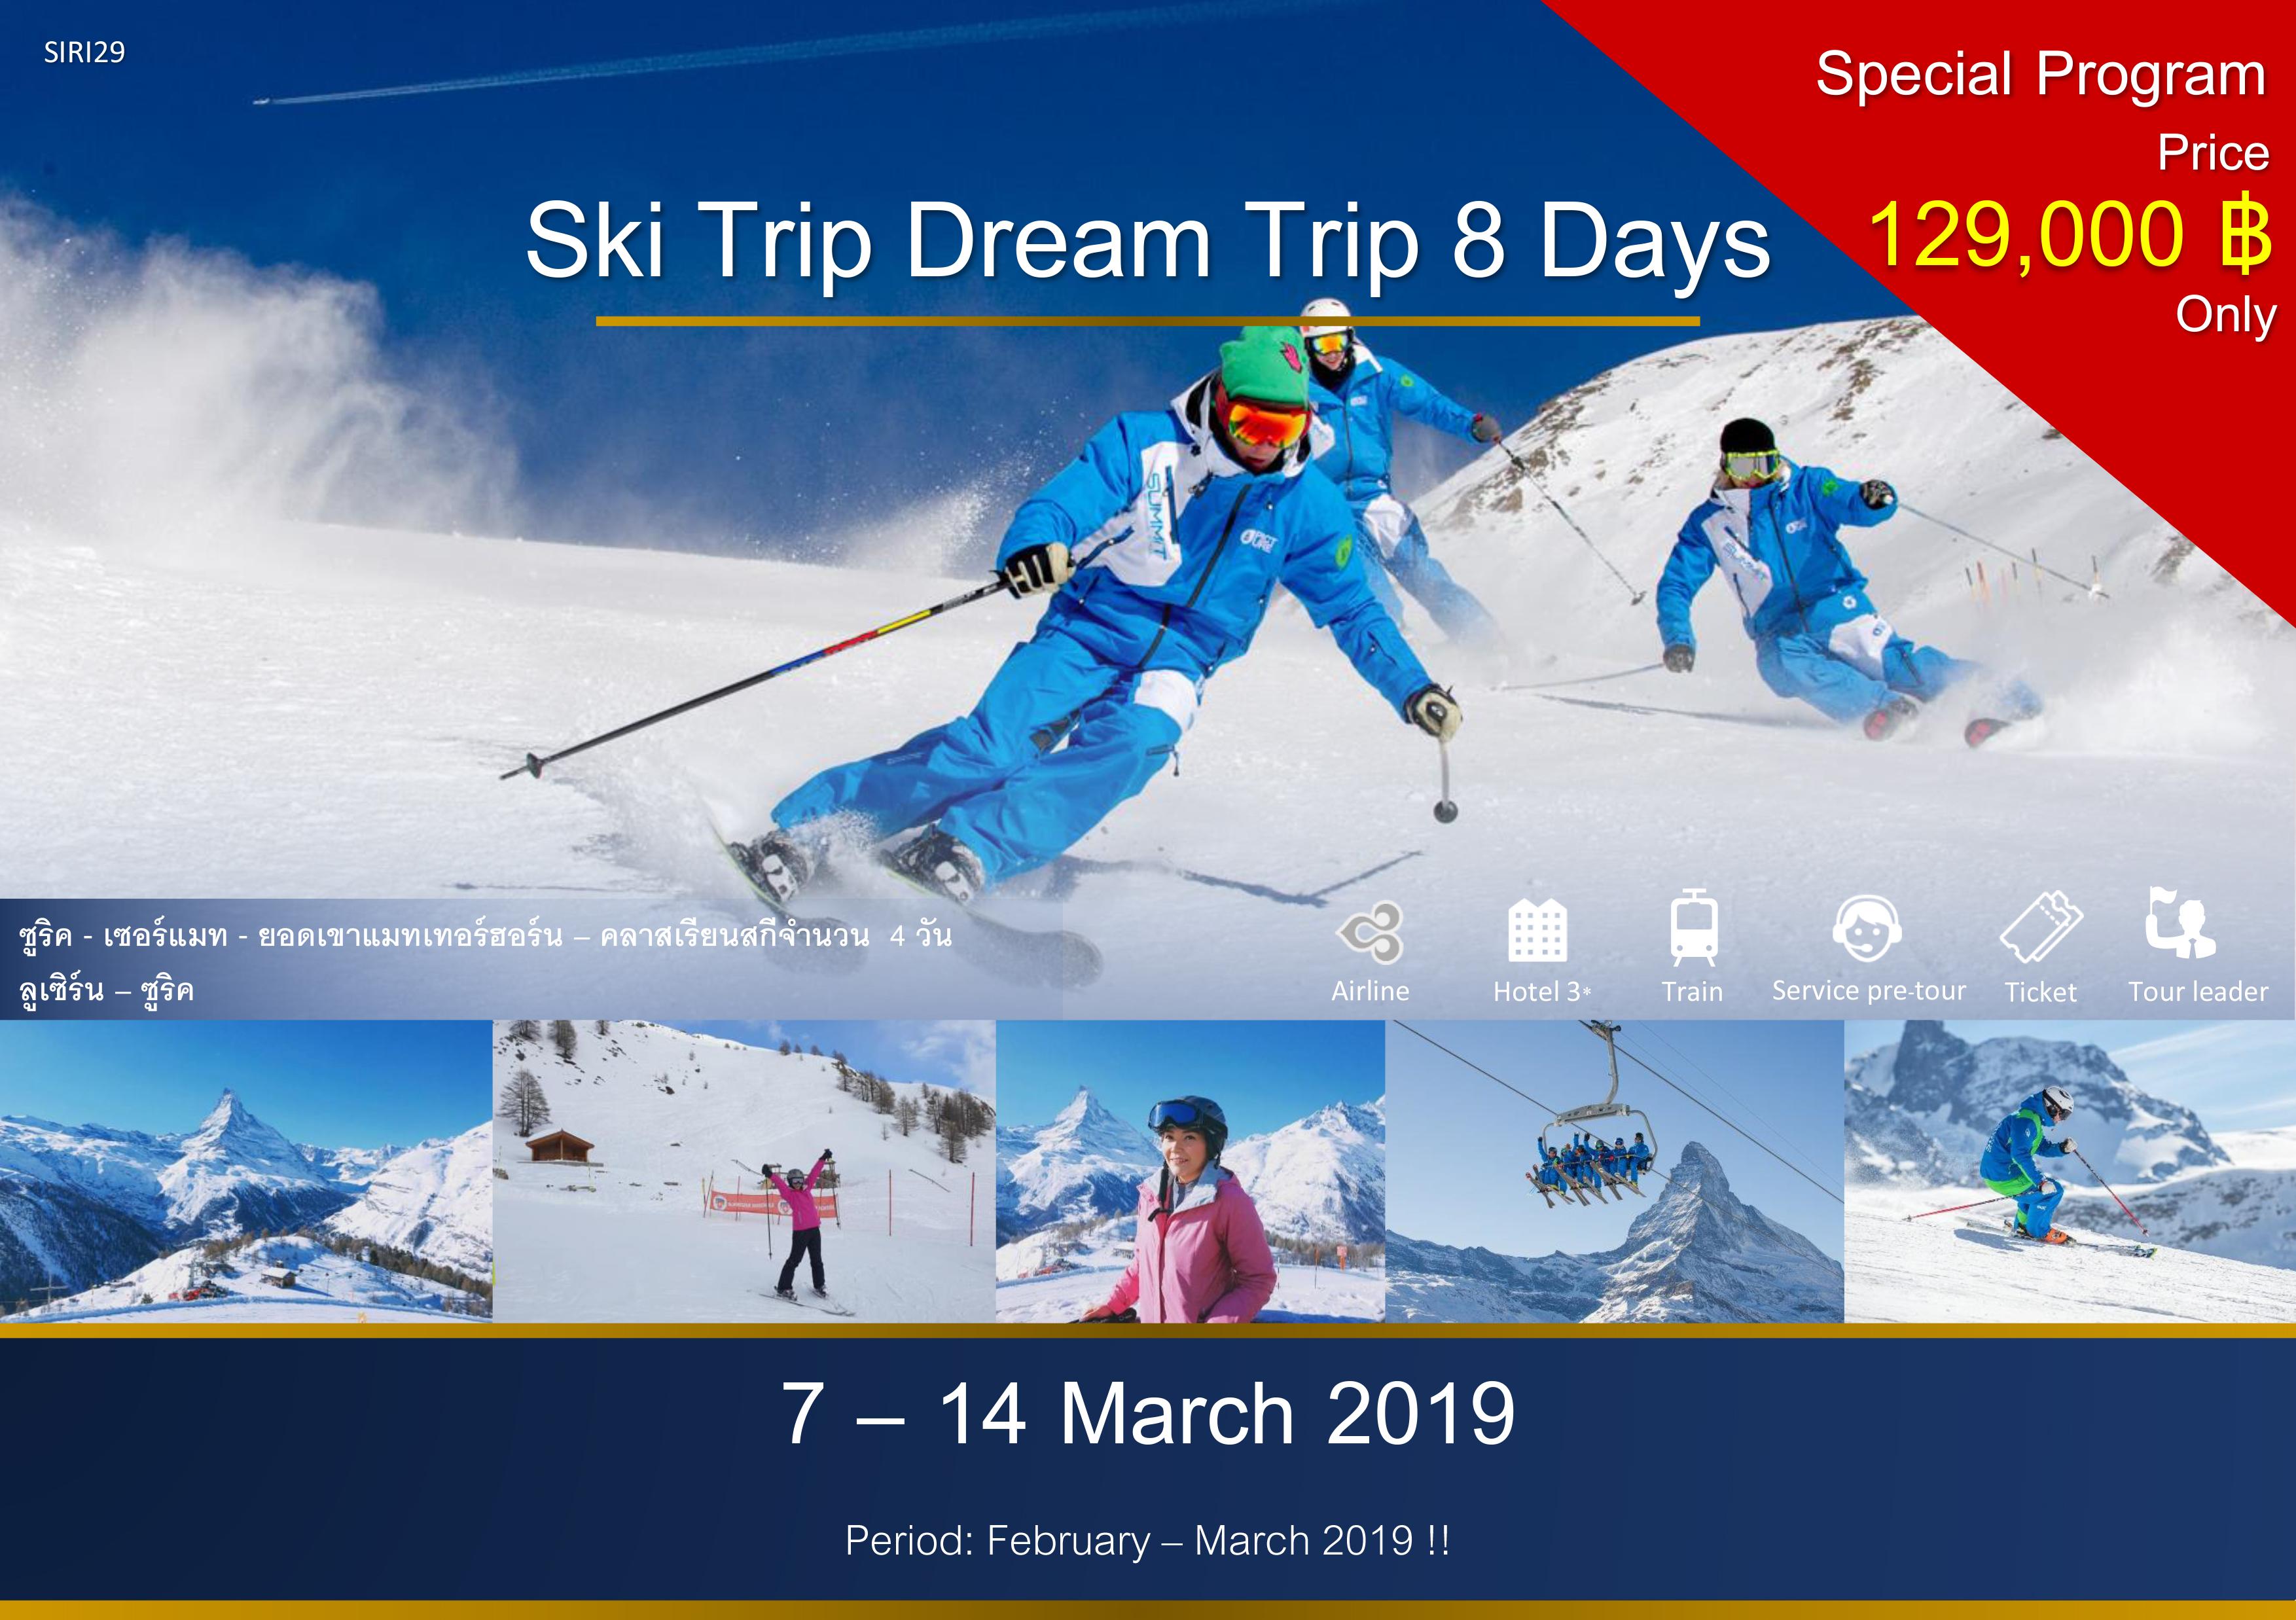 SIRI29 Ski Trip